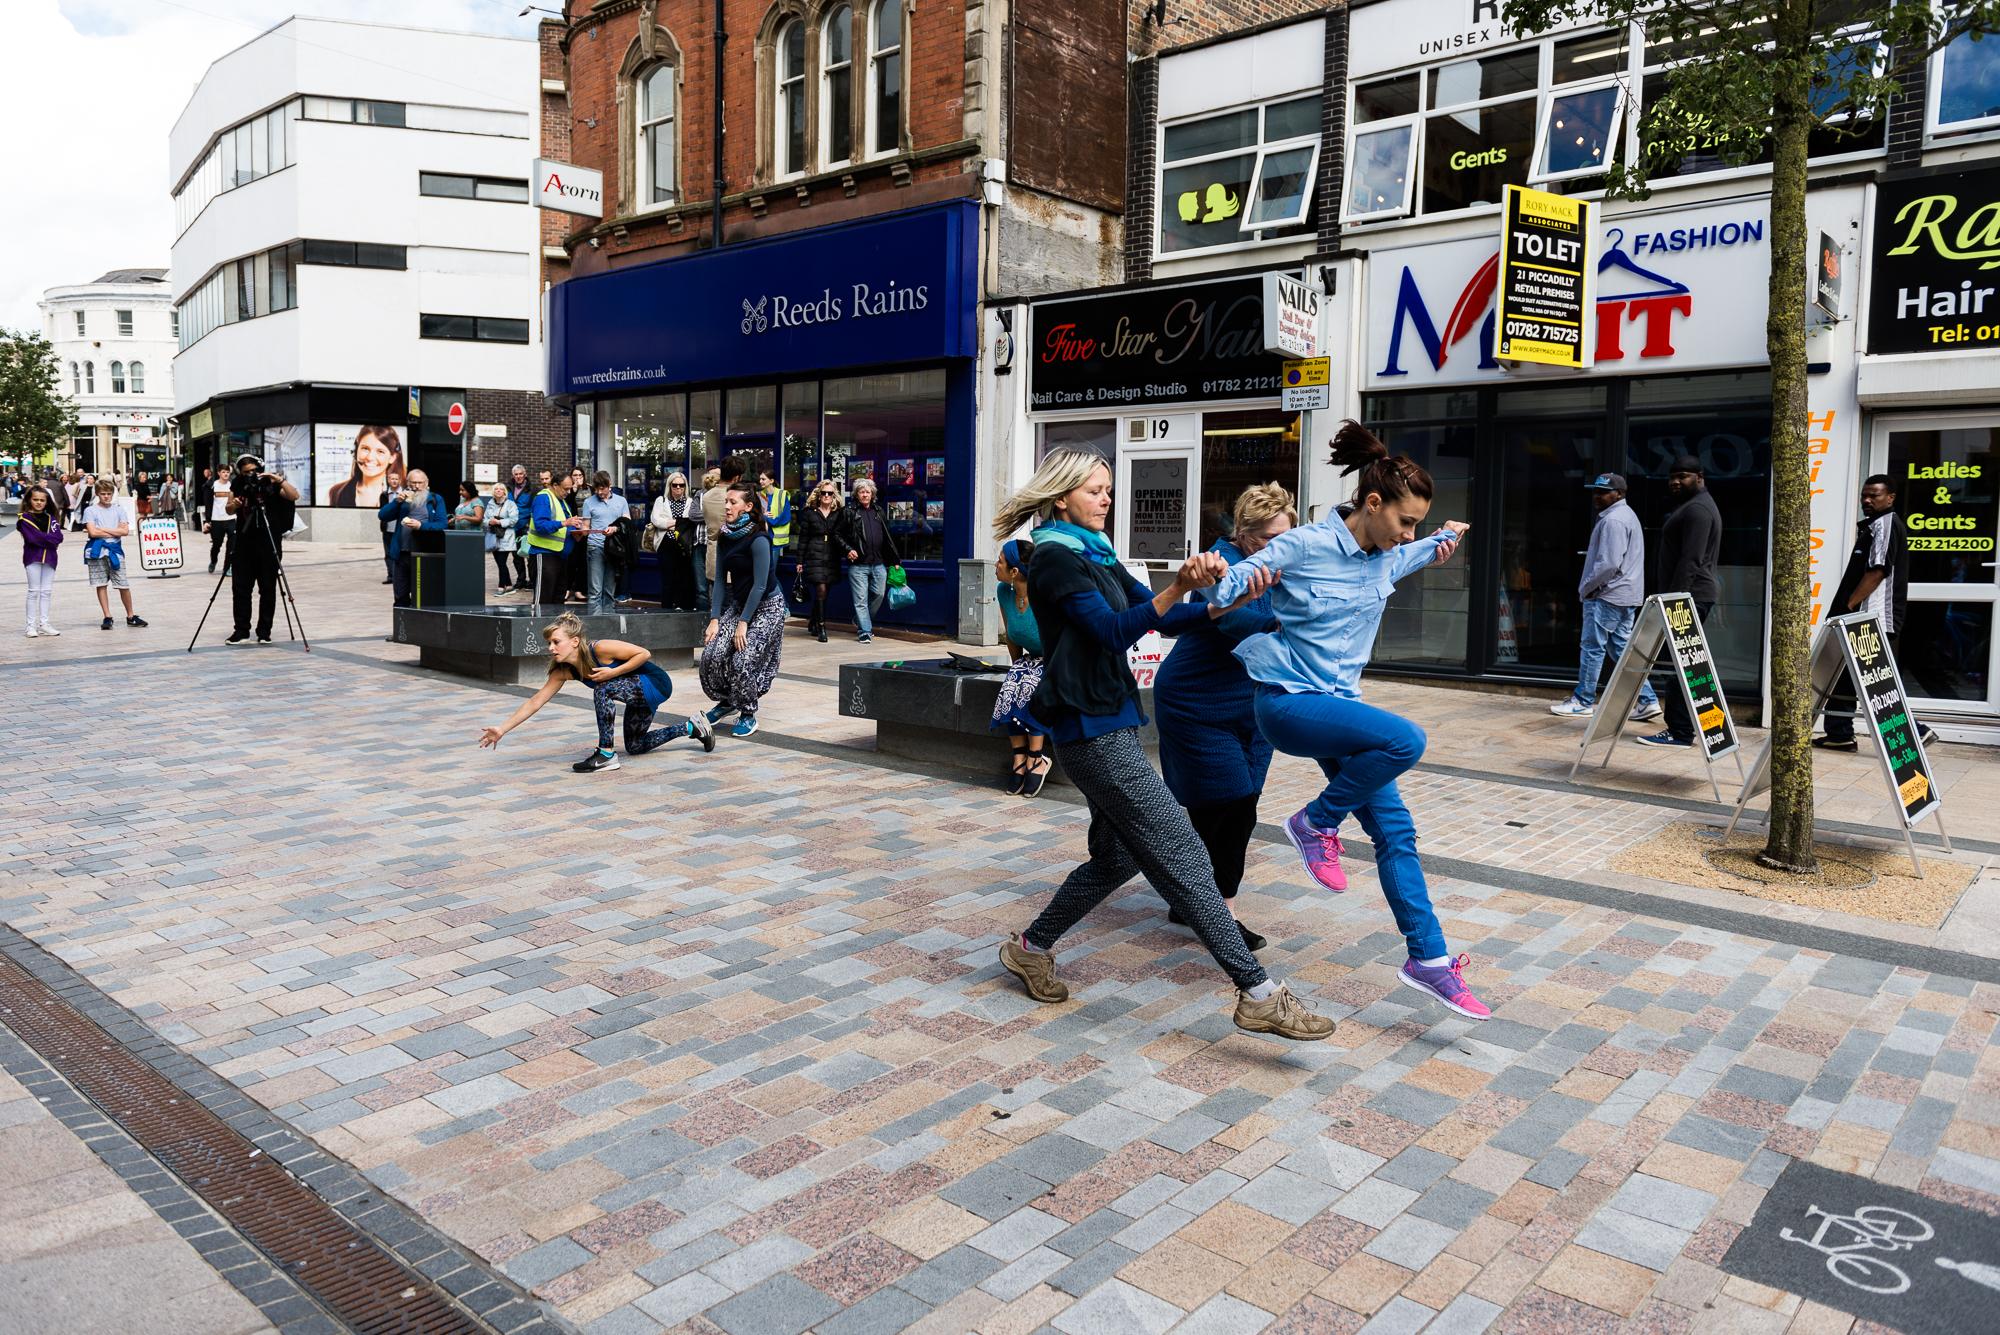 Documentary Photographs Dance Photography - Restoke - Big Dance - Dancing in the Street -  Picadilly, Hanley - Jenny Harper-2.jpg